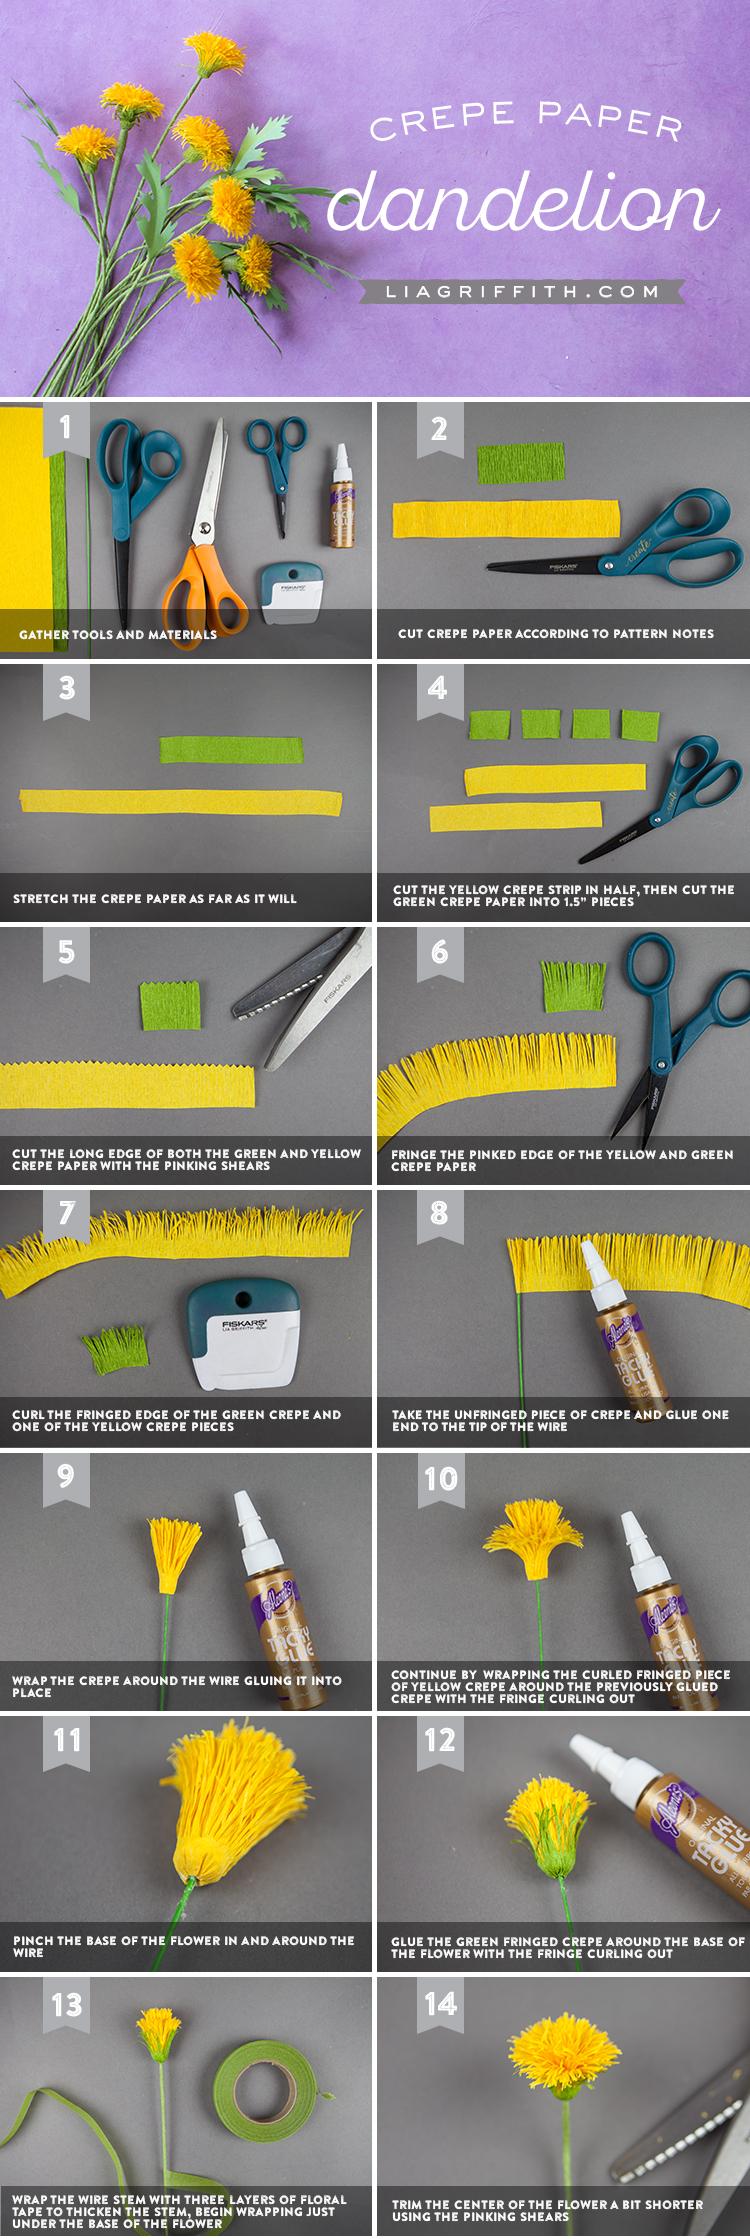 dandelion tutorial